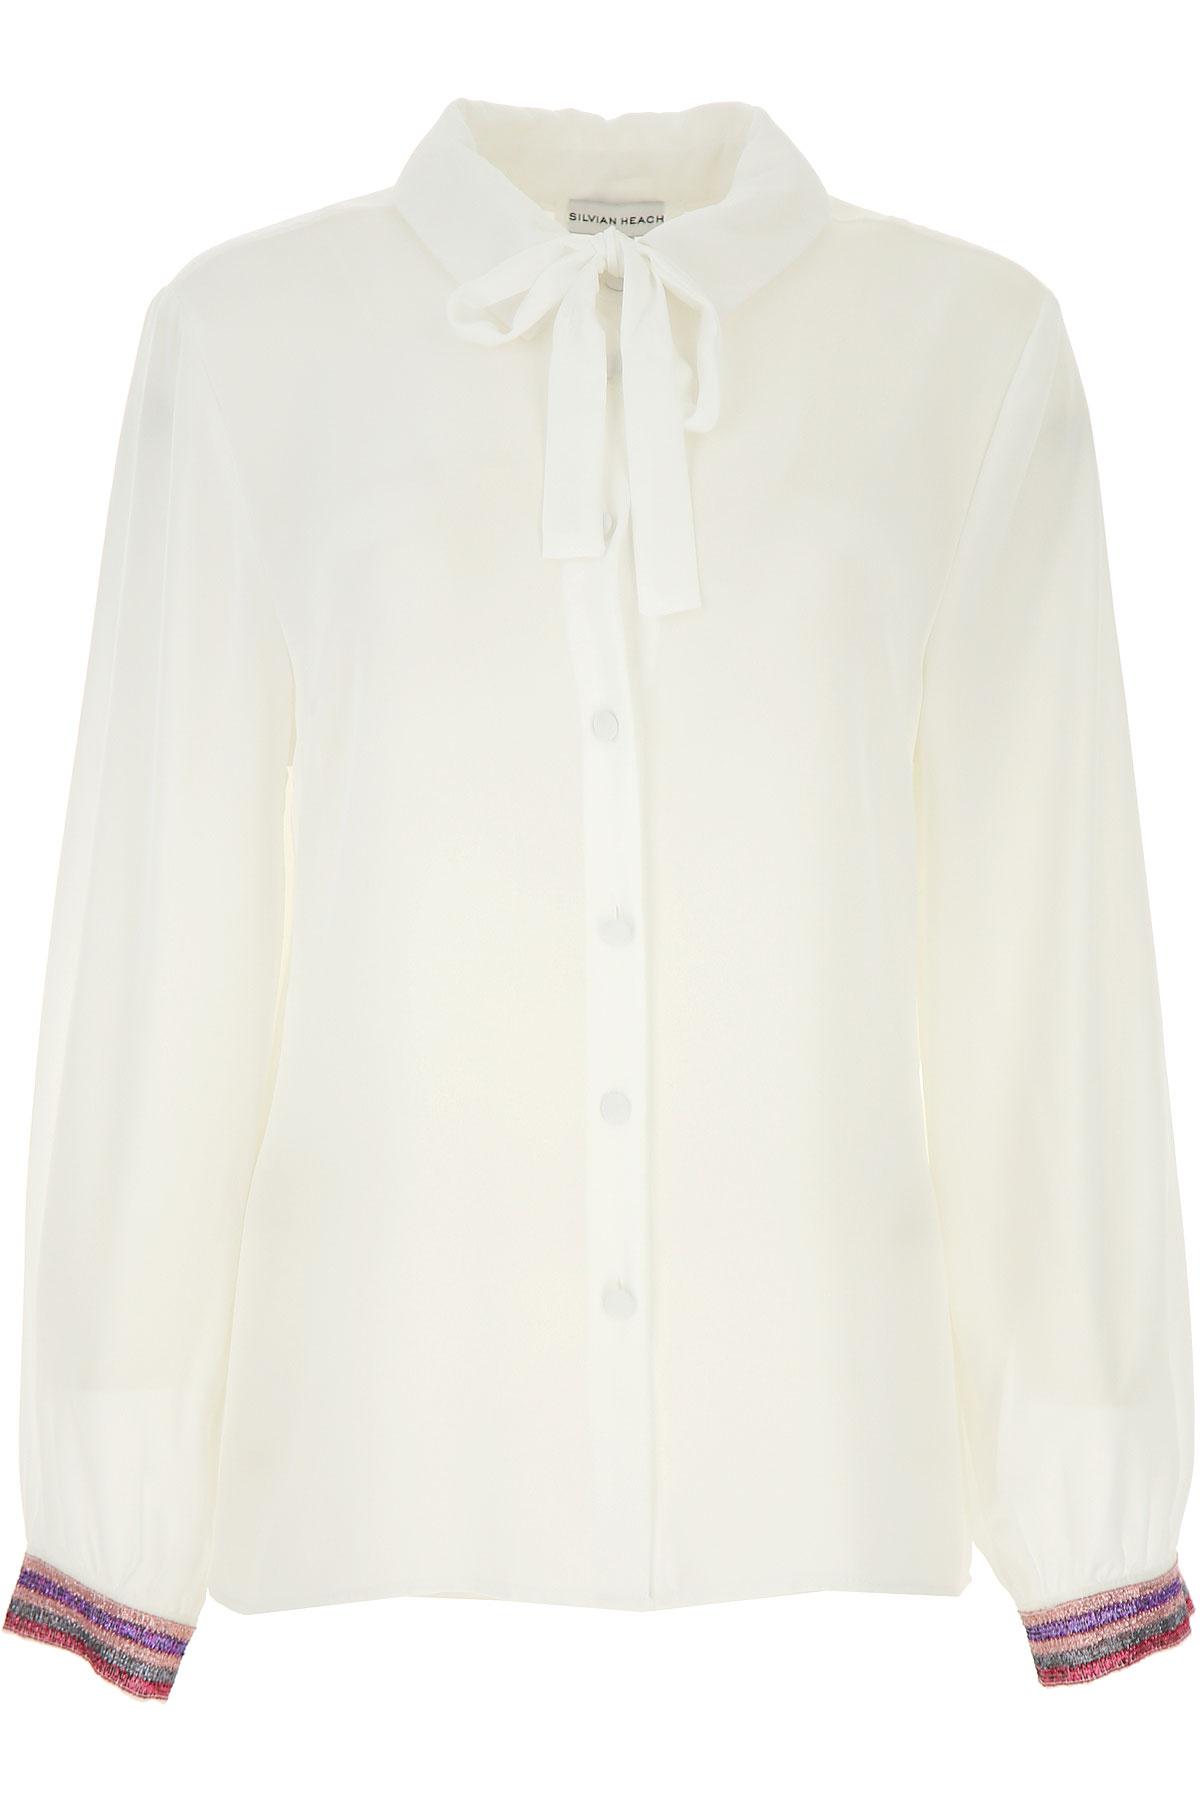 Silvian Heach Shirt for Women On Sale, White, polyester, 2019, 2 4